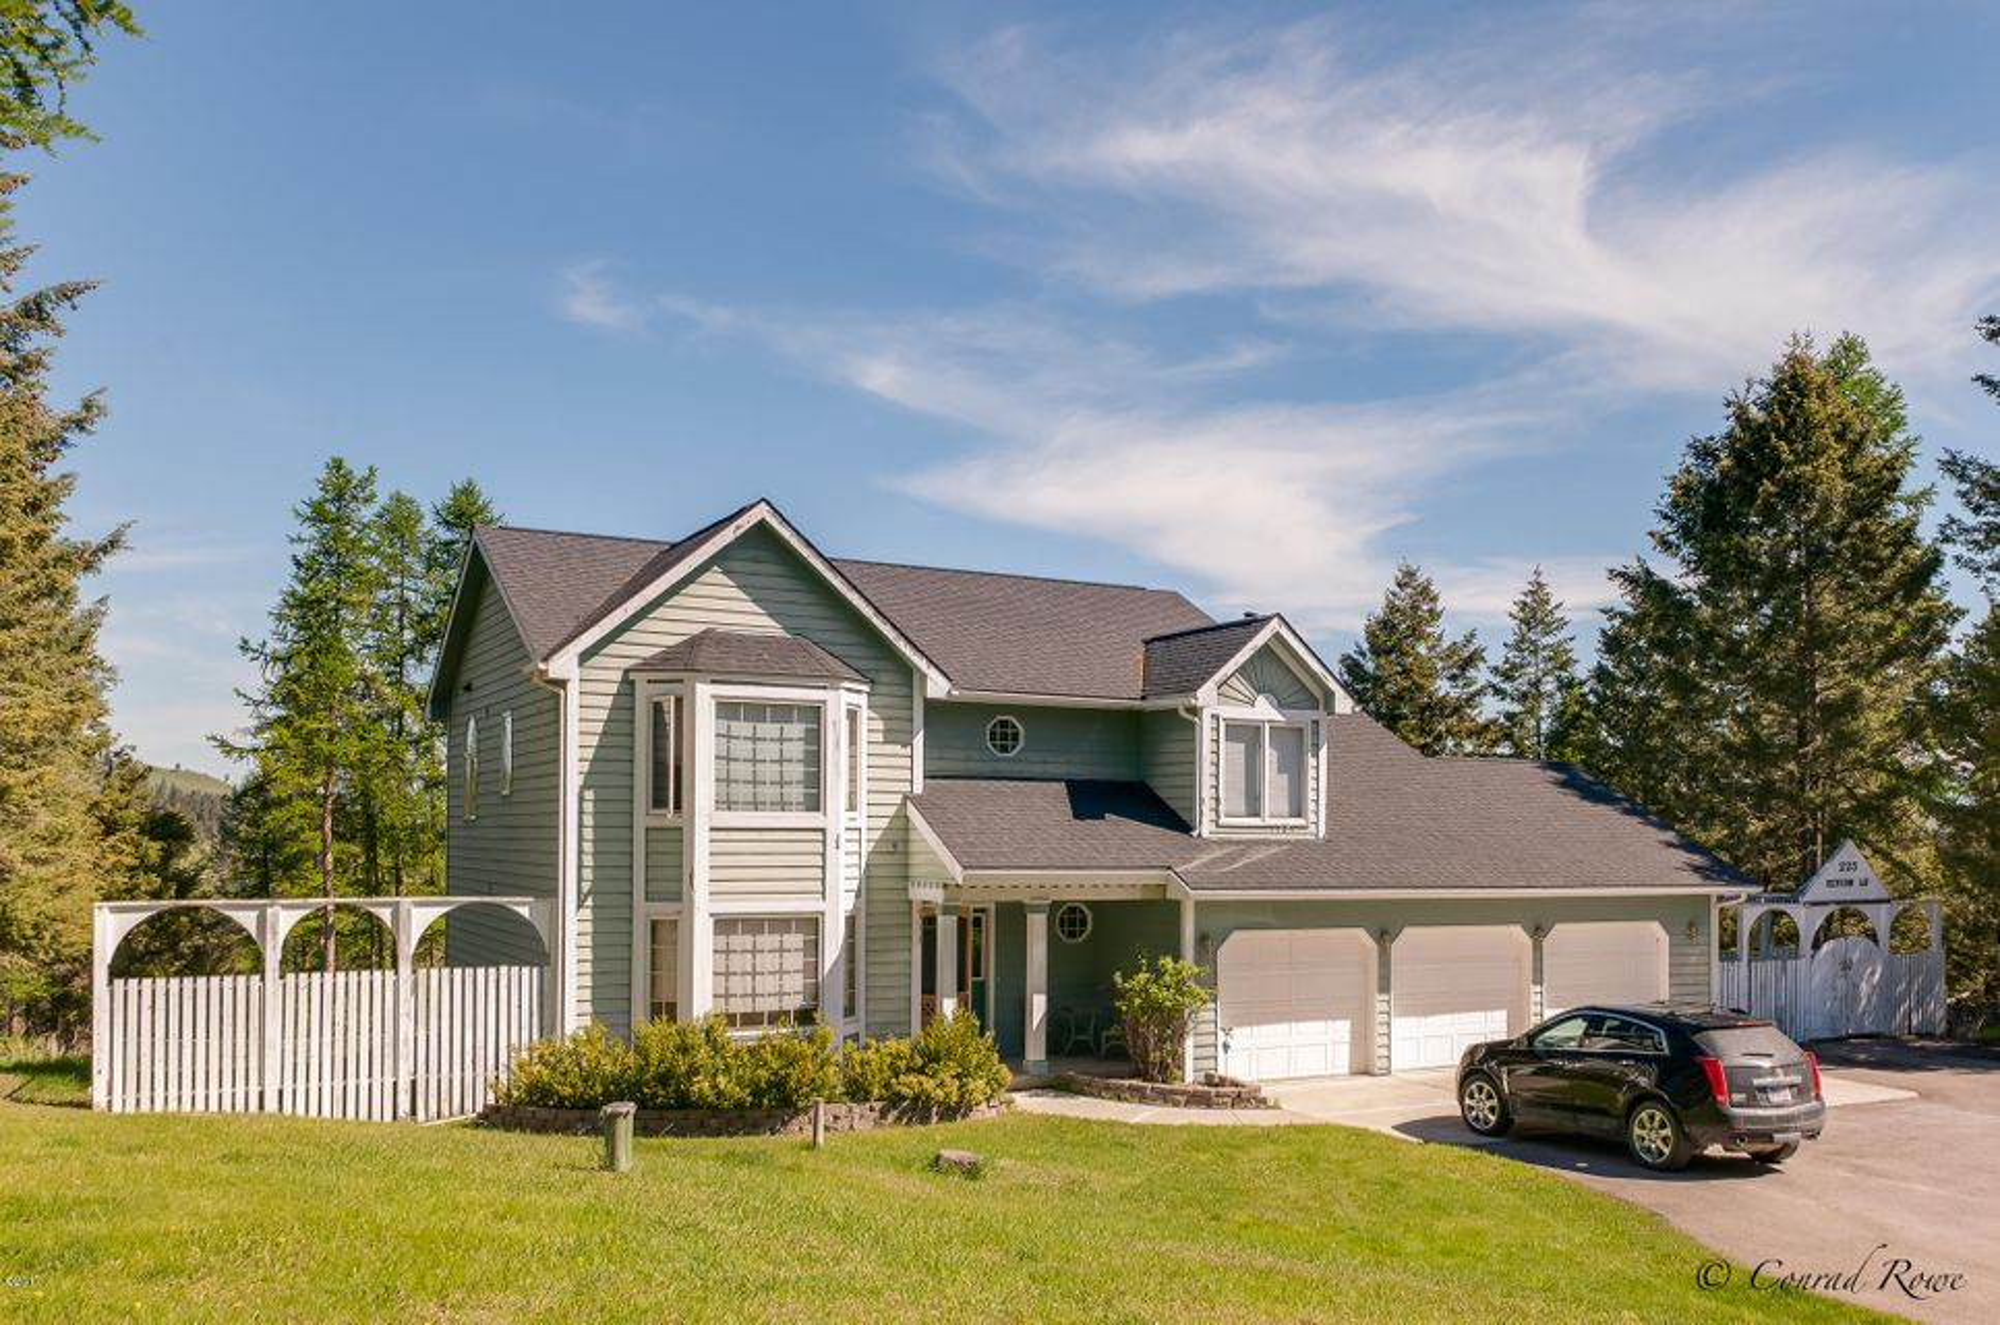 Single Family Home for Sale at 225 Newsom Lane Kalispell, Montana 59901 United States